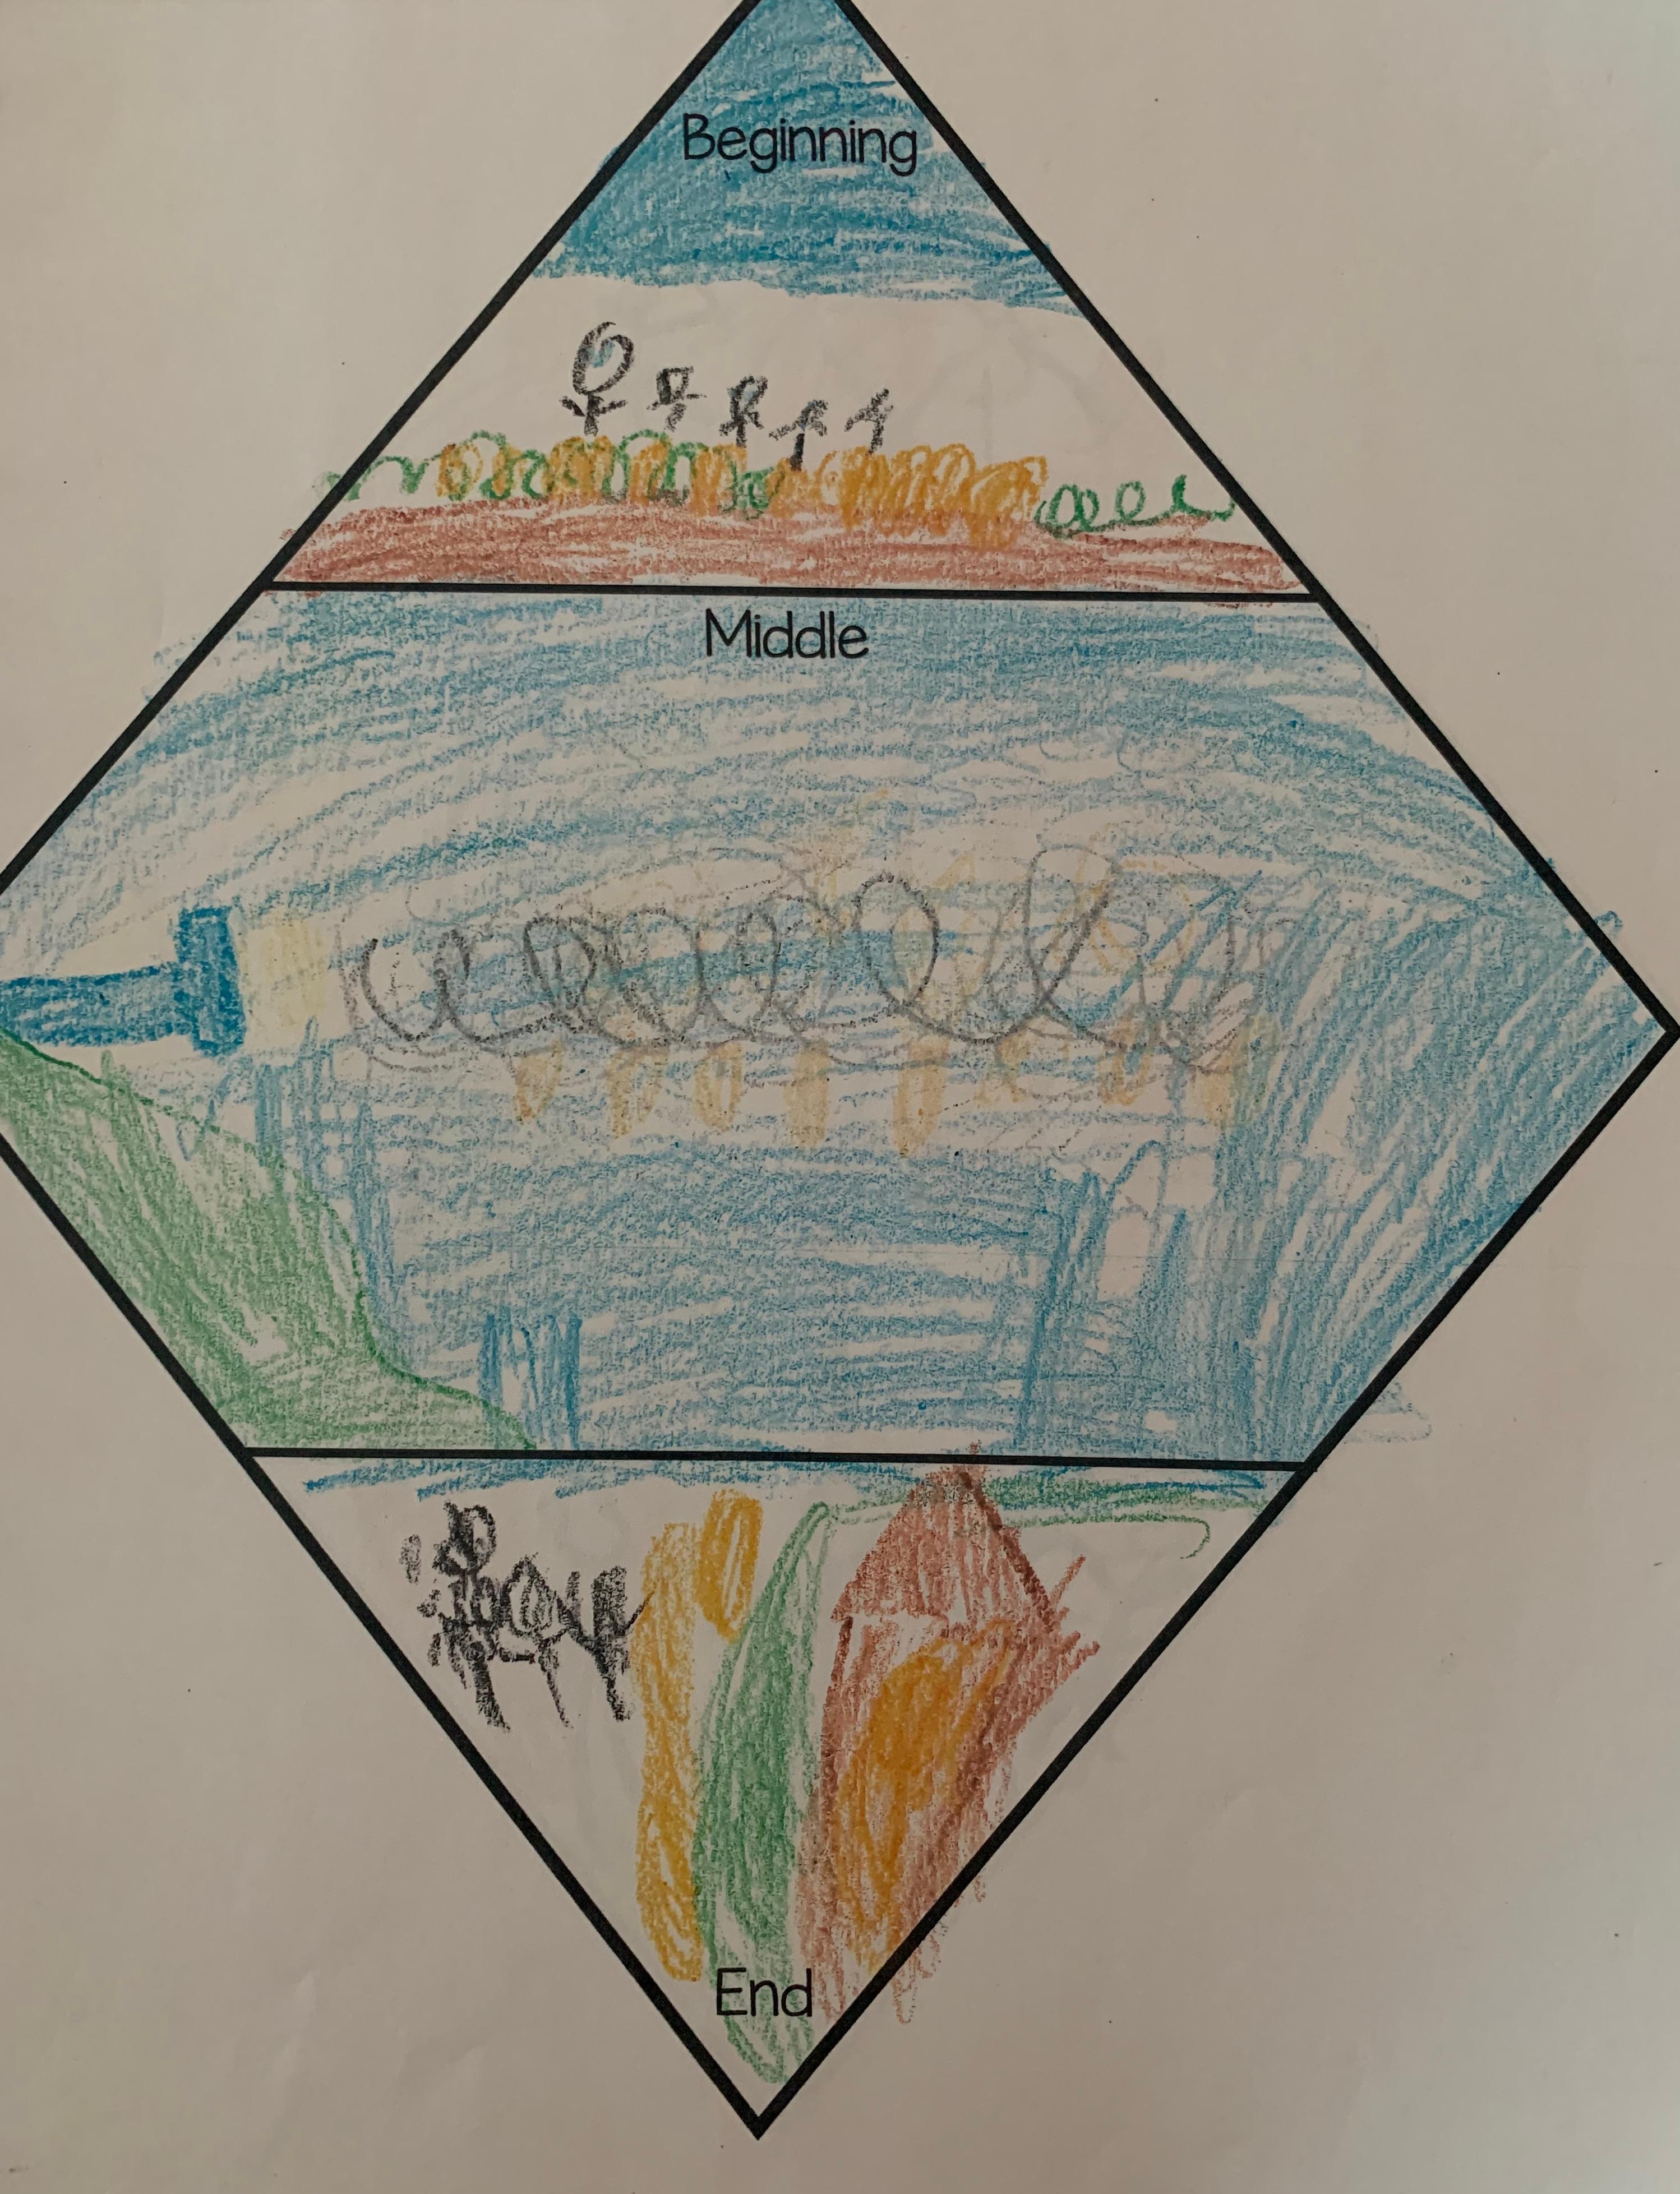 Beginning, Middle, End: Starting Foundational Skills in Kindergarten